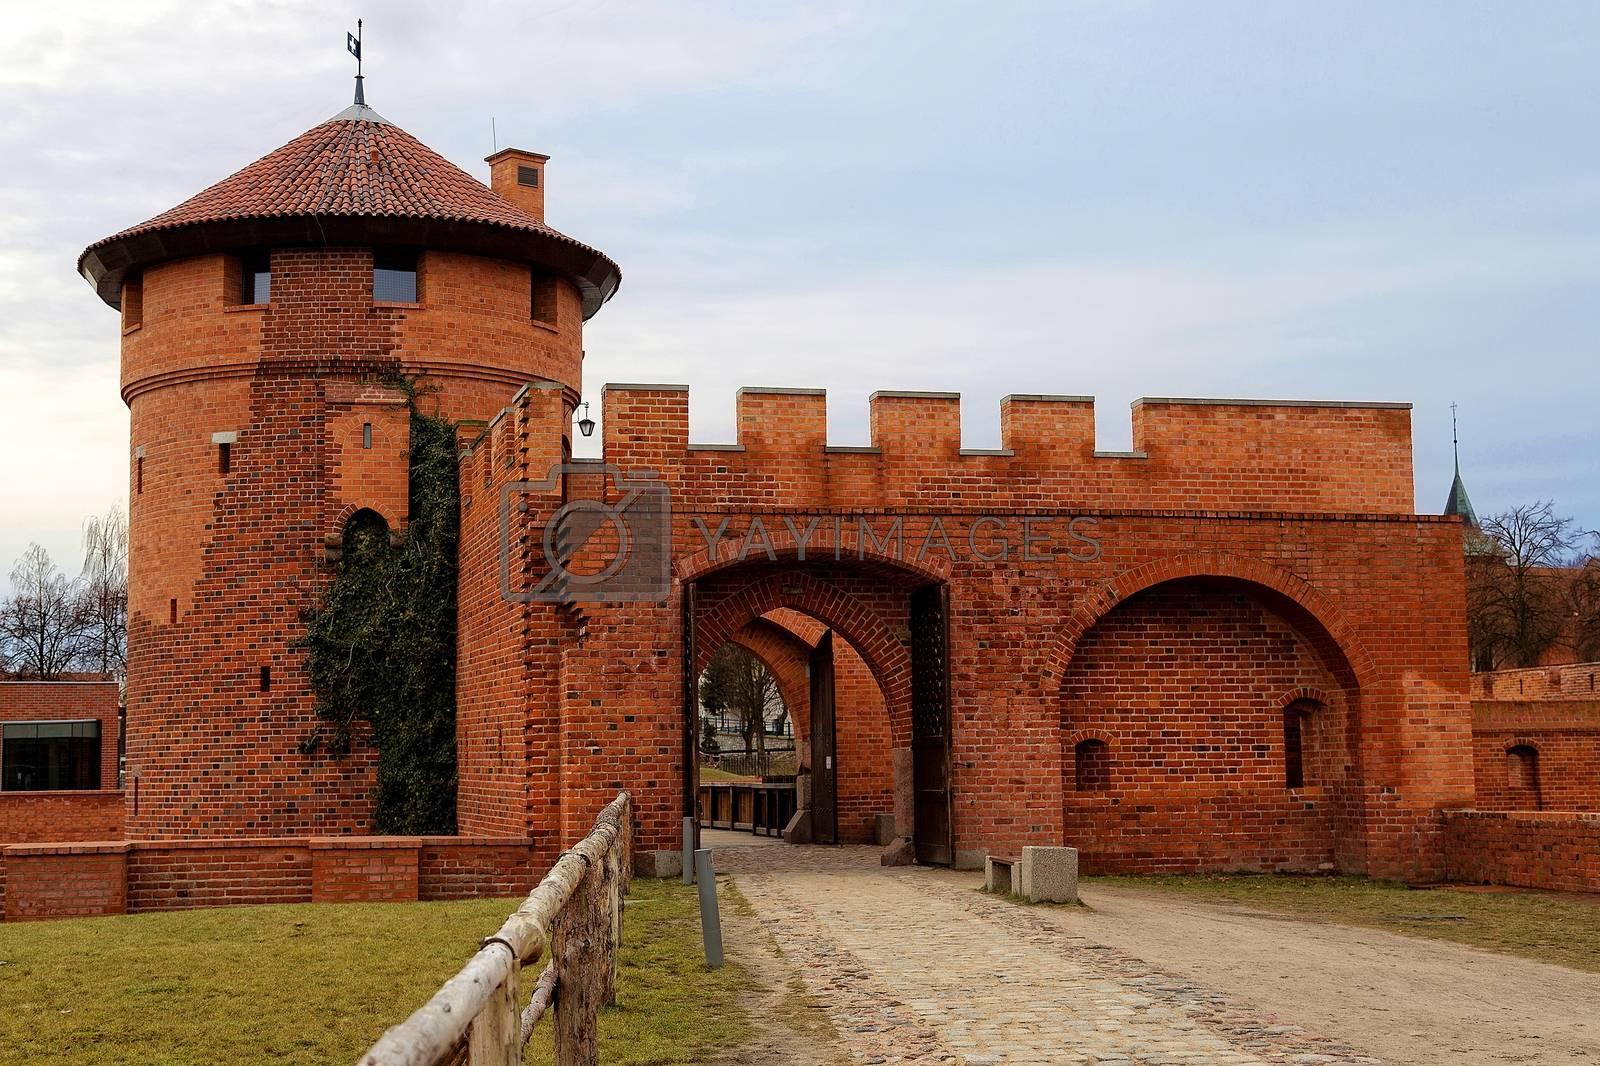 Castle in Malbork in Poland, entrence gate